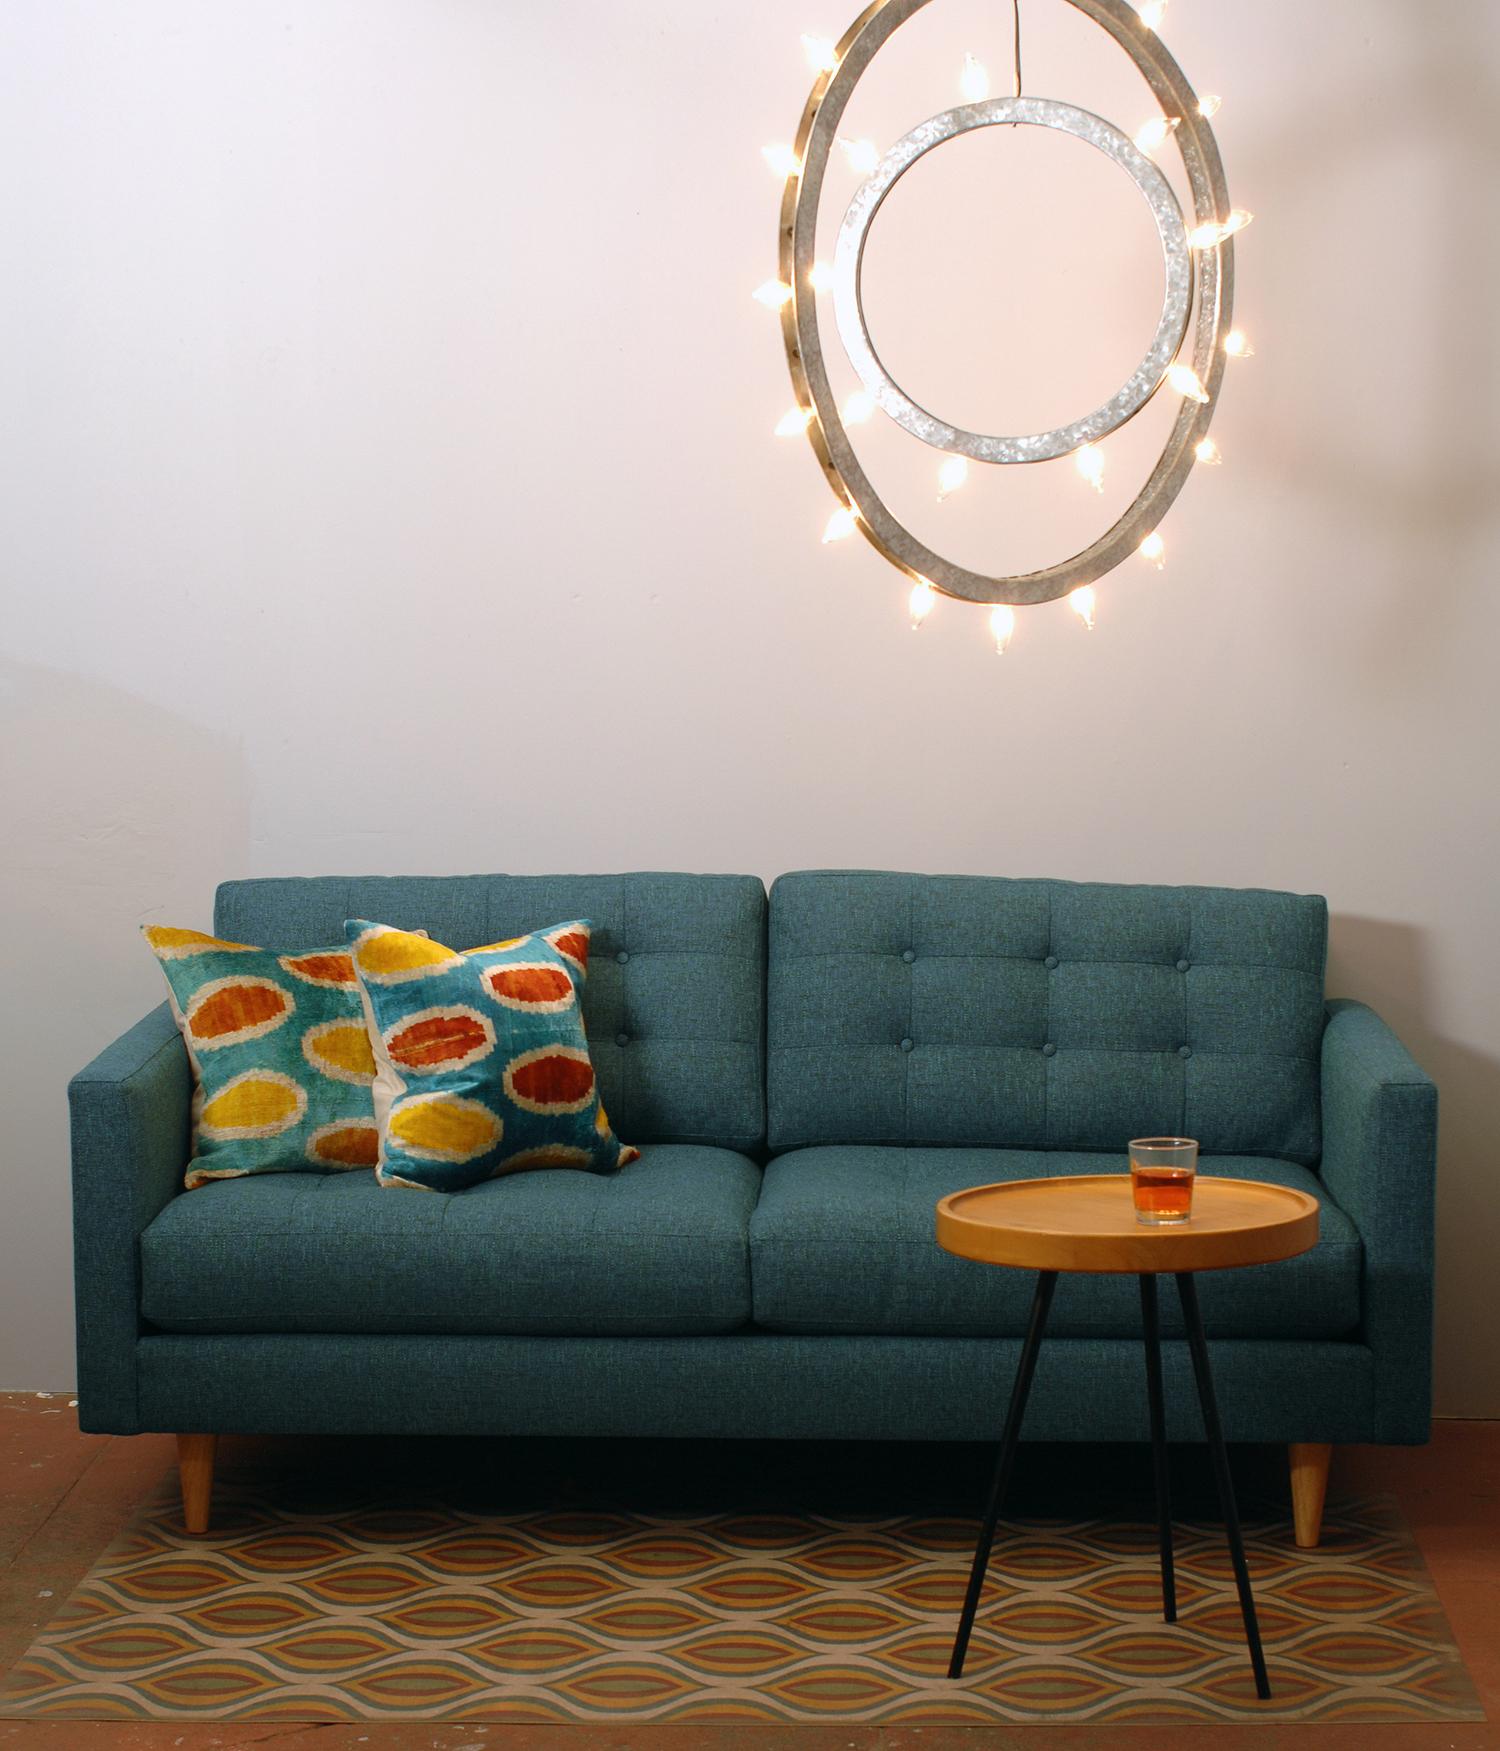 Custom sofas Furniture Store in San Francisco | Harrington Galleries San Francisco, Ca